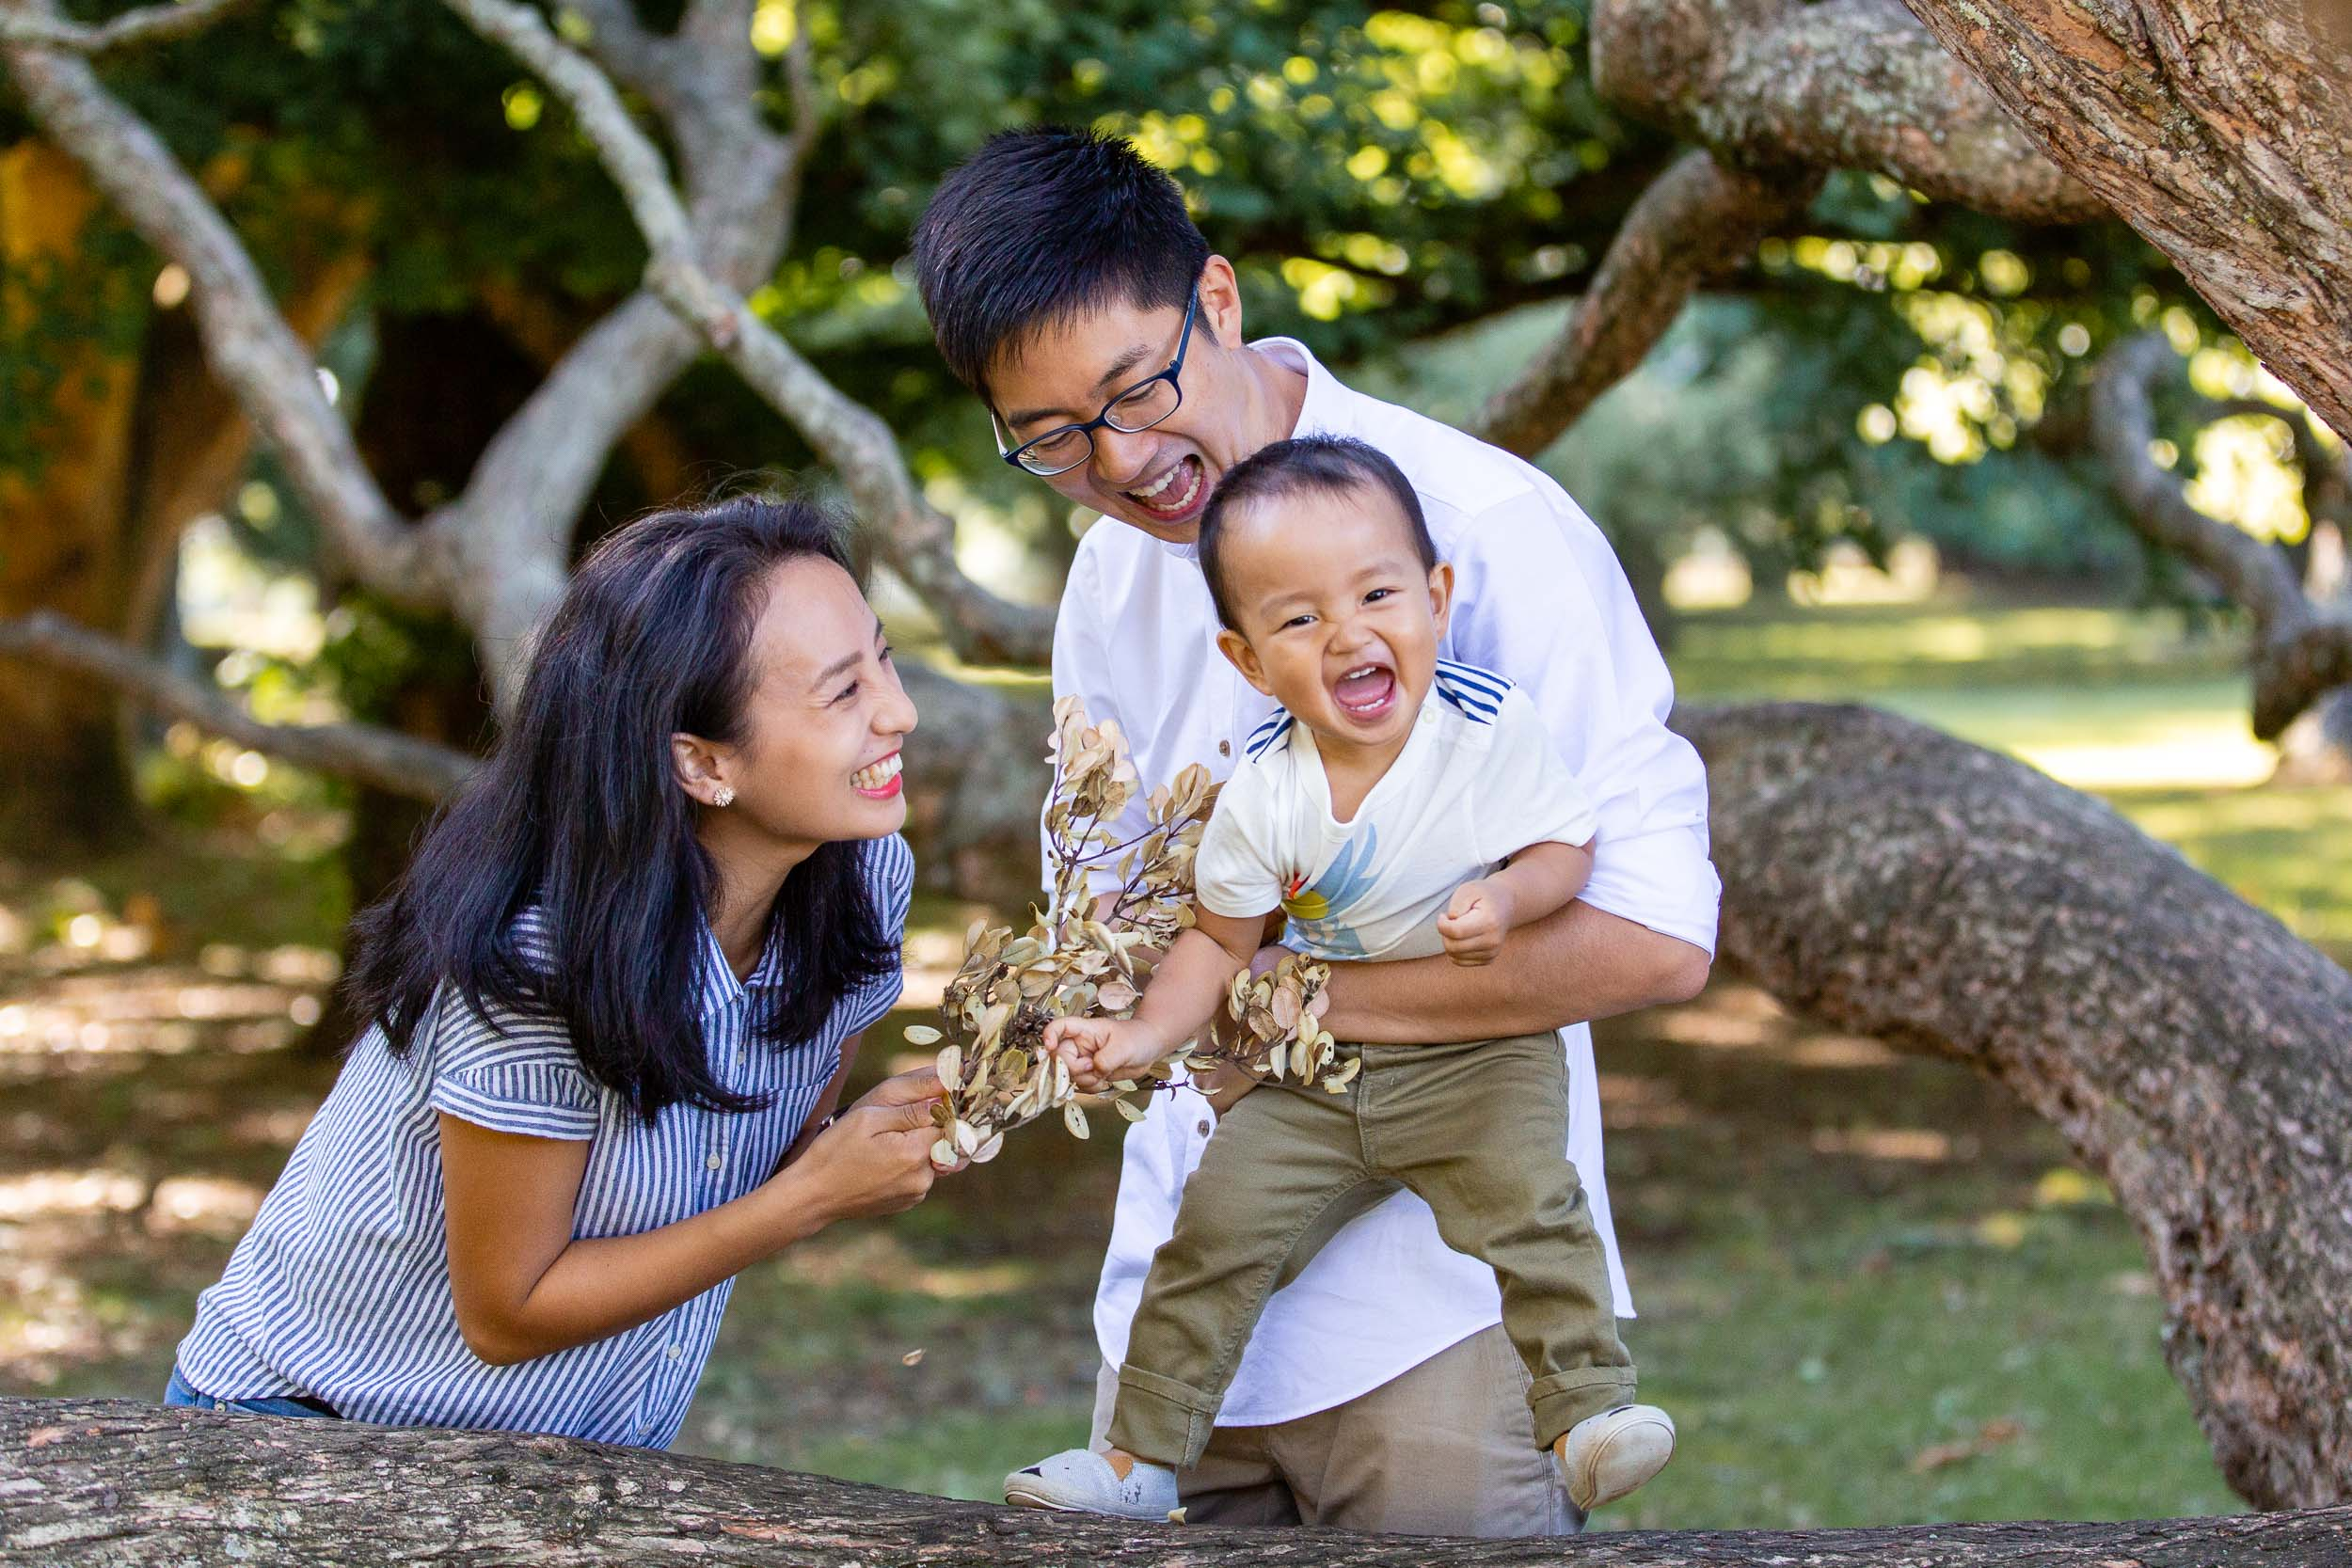 Aucklandfamilyphotographer (1 of 2).jpg